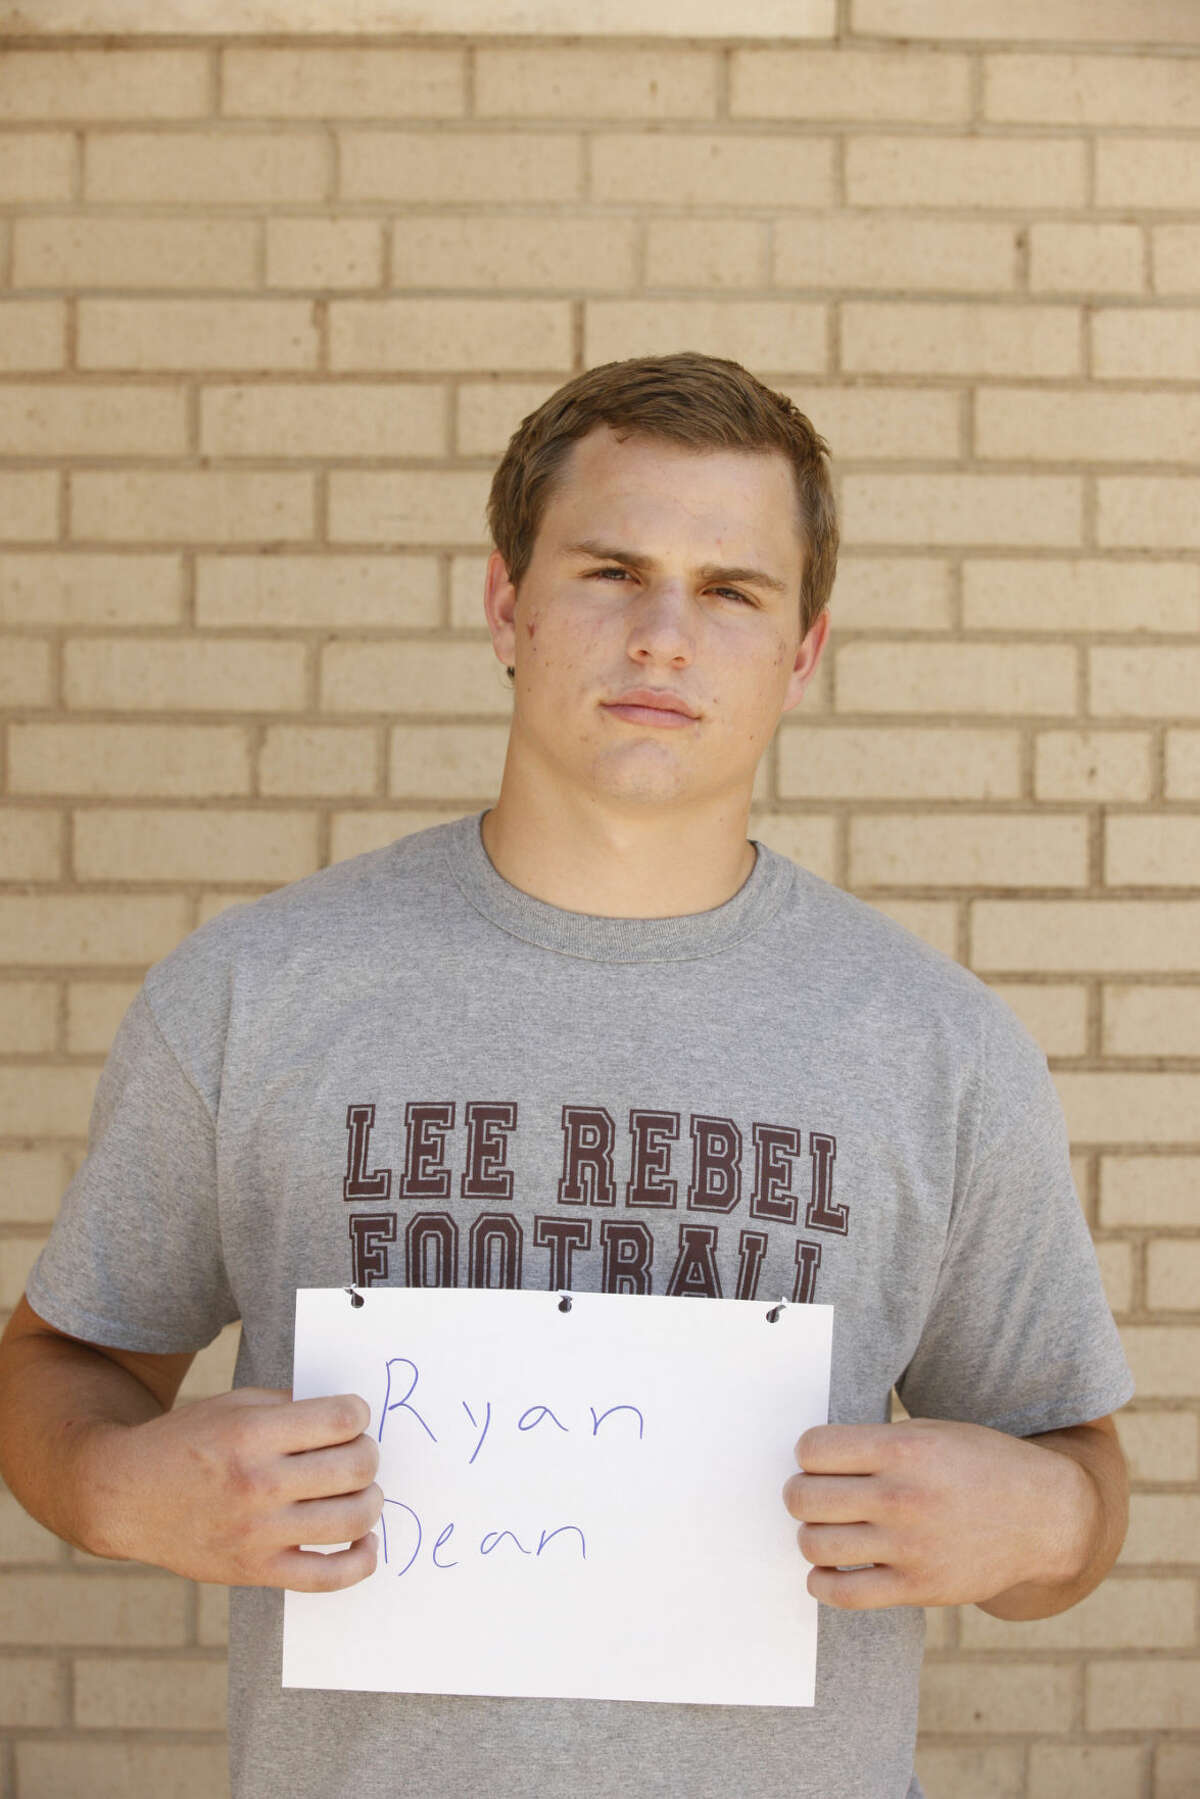 Lee High football mug Ryan Dean James Durbin/Reporter-Telegram